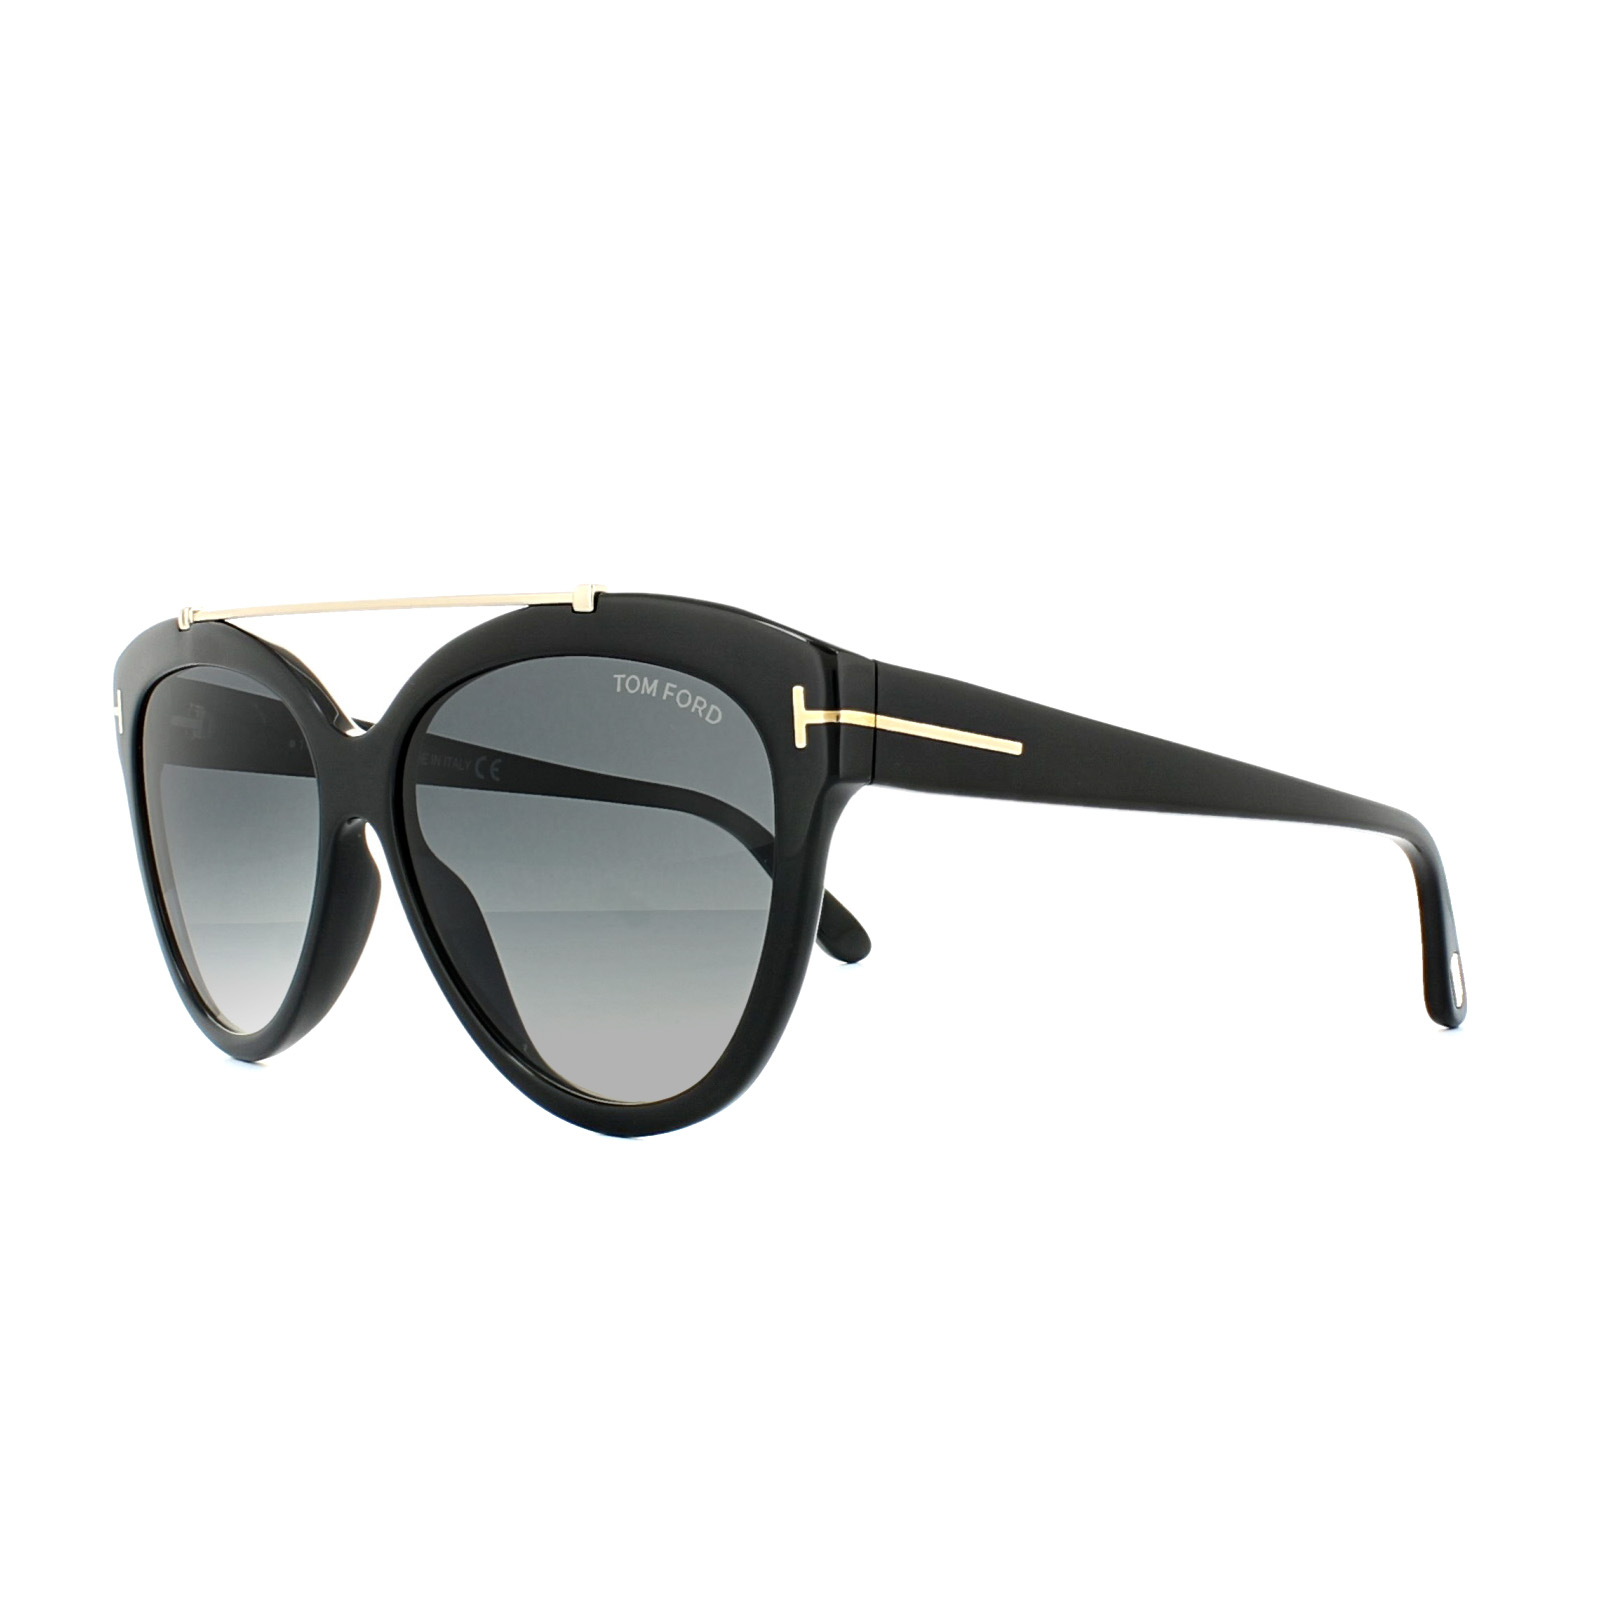 06781e5e3703 Sentinel Tom Ford Sunglasses 0518 Livia 01B Shiny Black Grey Gradient